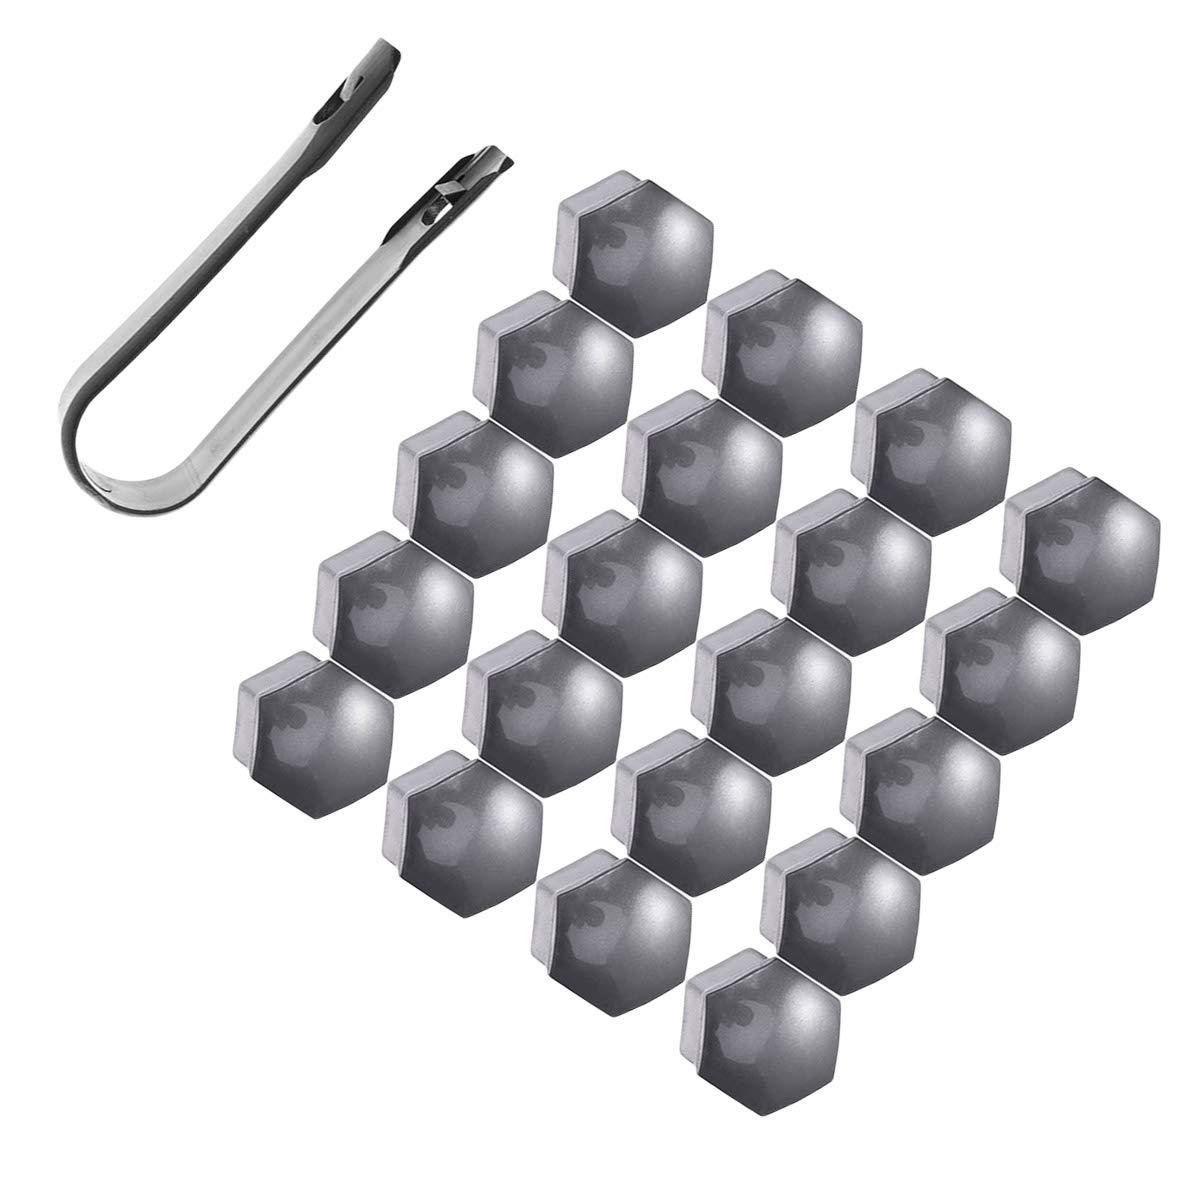 Grey Vosarea 21 in 1 20 Pieces Plastic Screw Caps for Tyres 21 mm with 1 Piece Clip